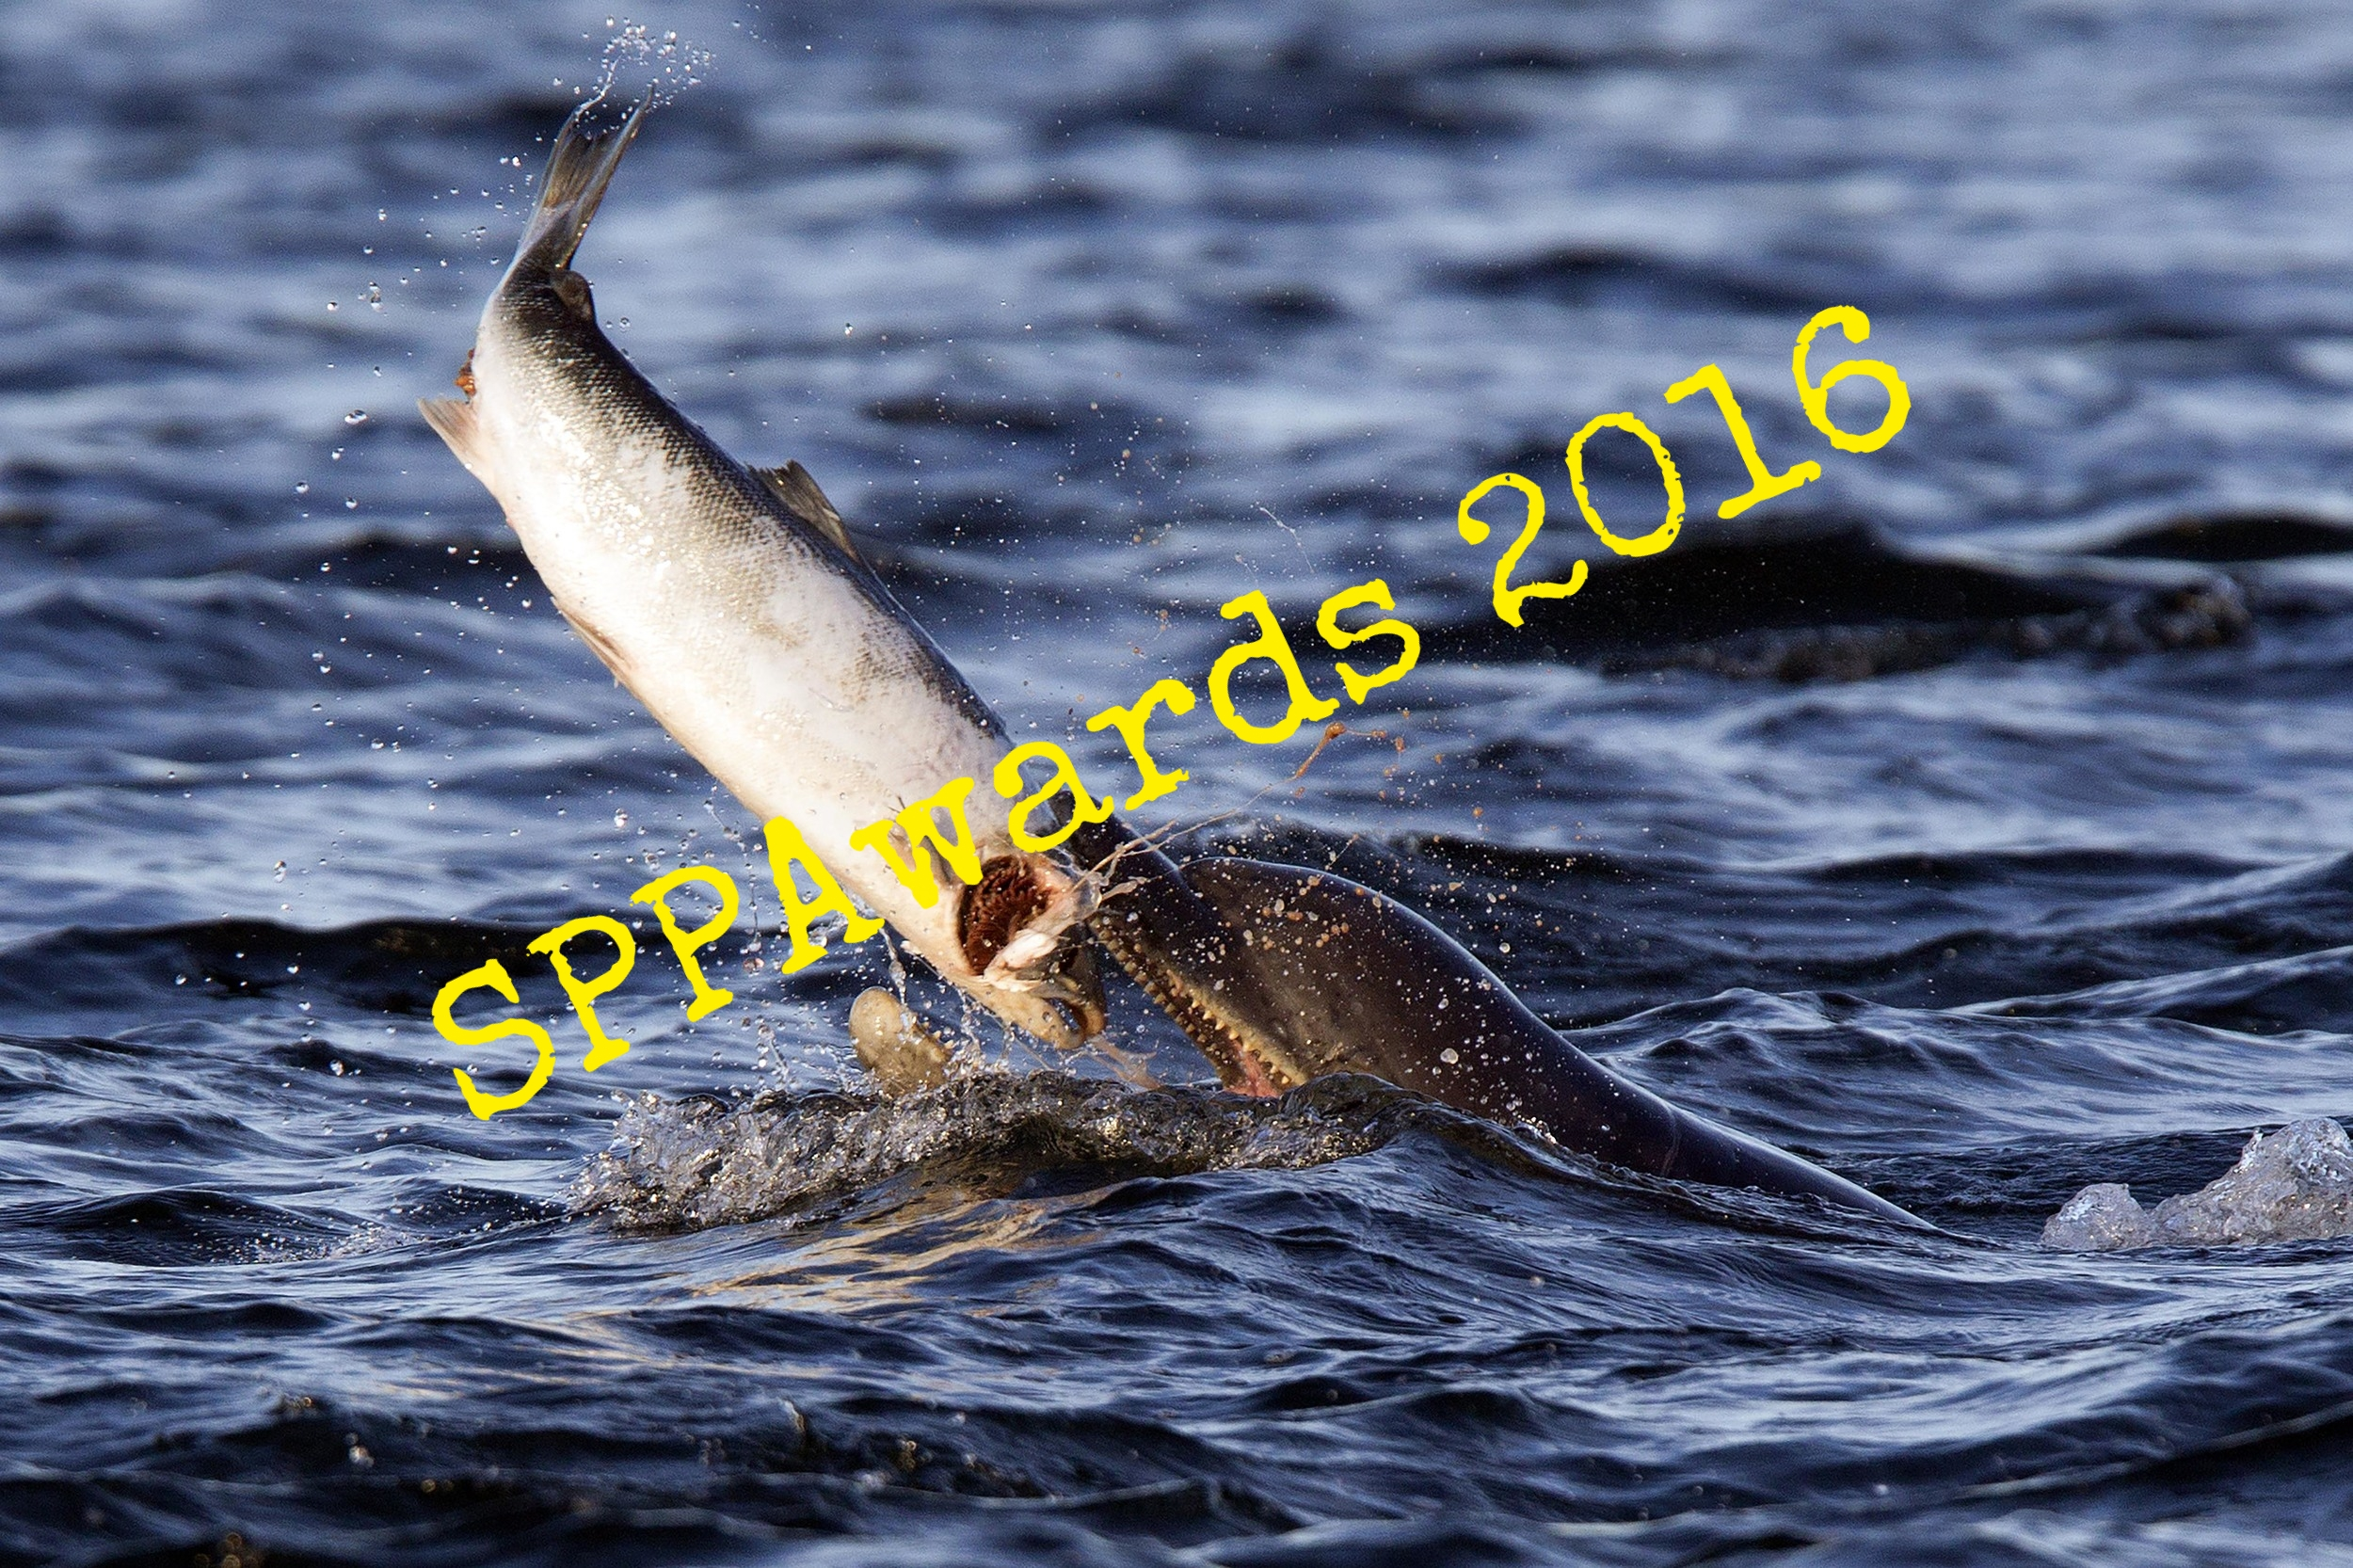 Dolphin Eating Salmon.JPG